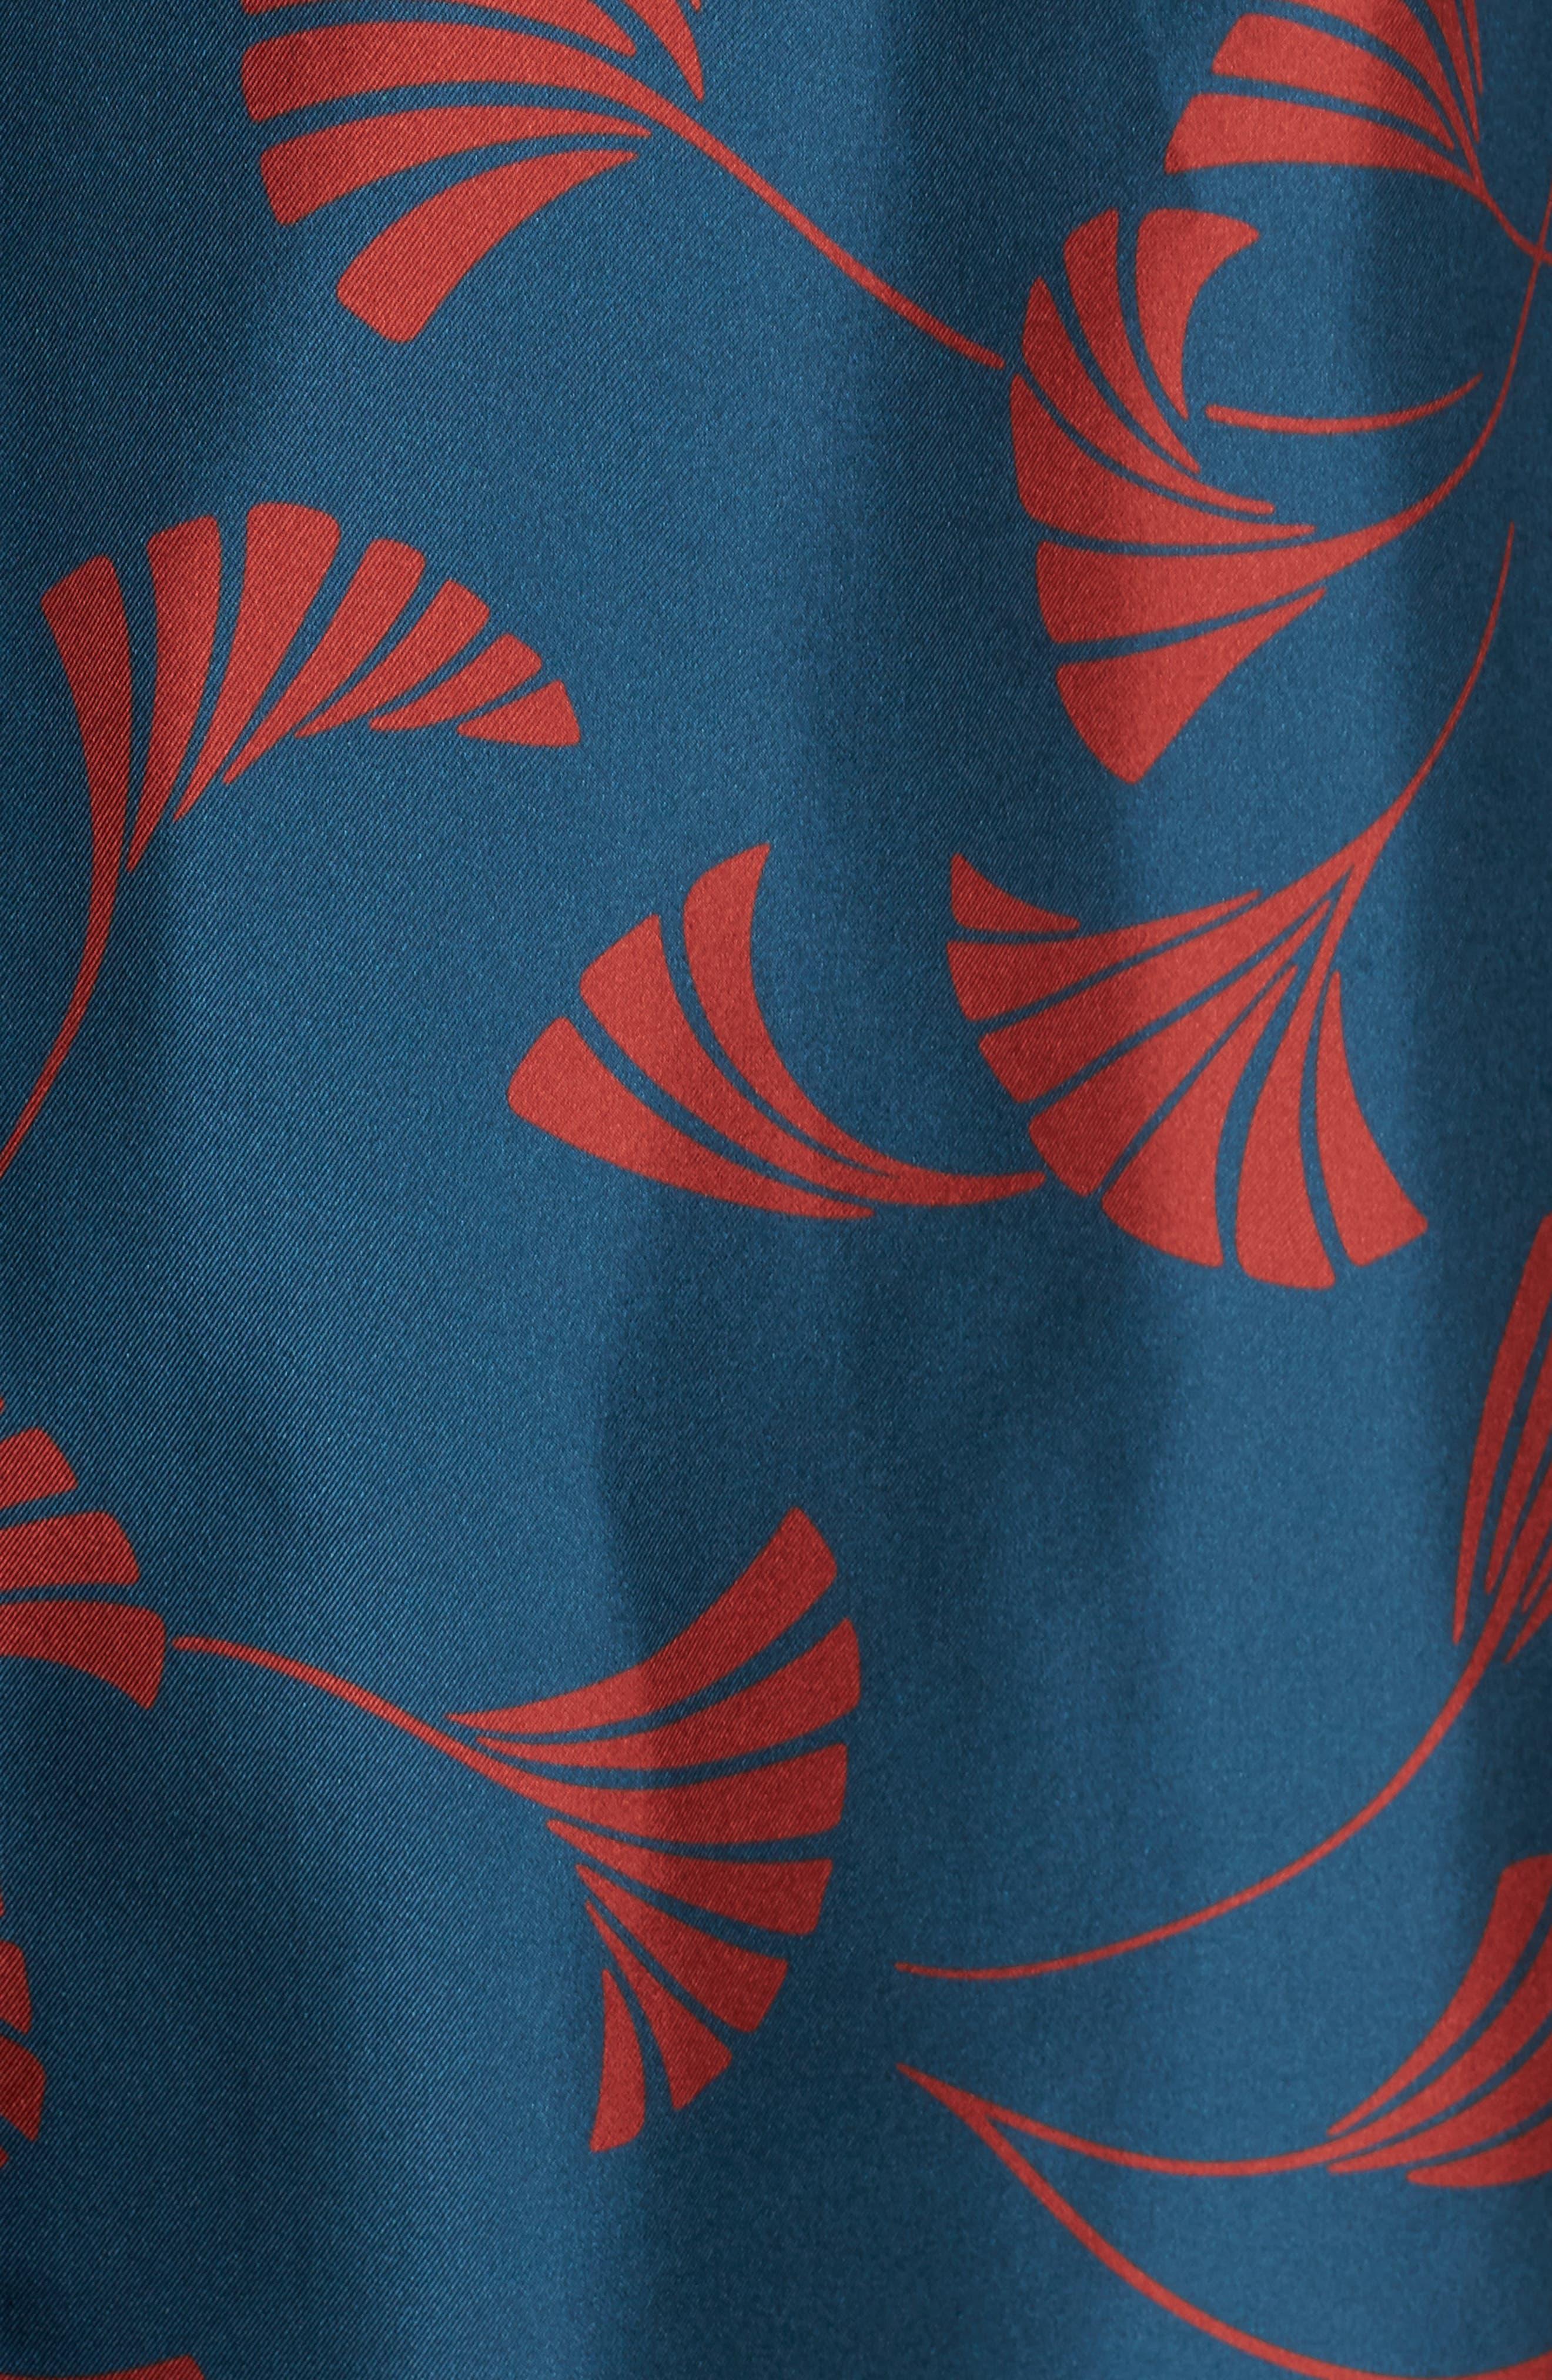 Brayden Silk Blouse,                             Alternate thumbnail 5, color,                             440